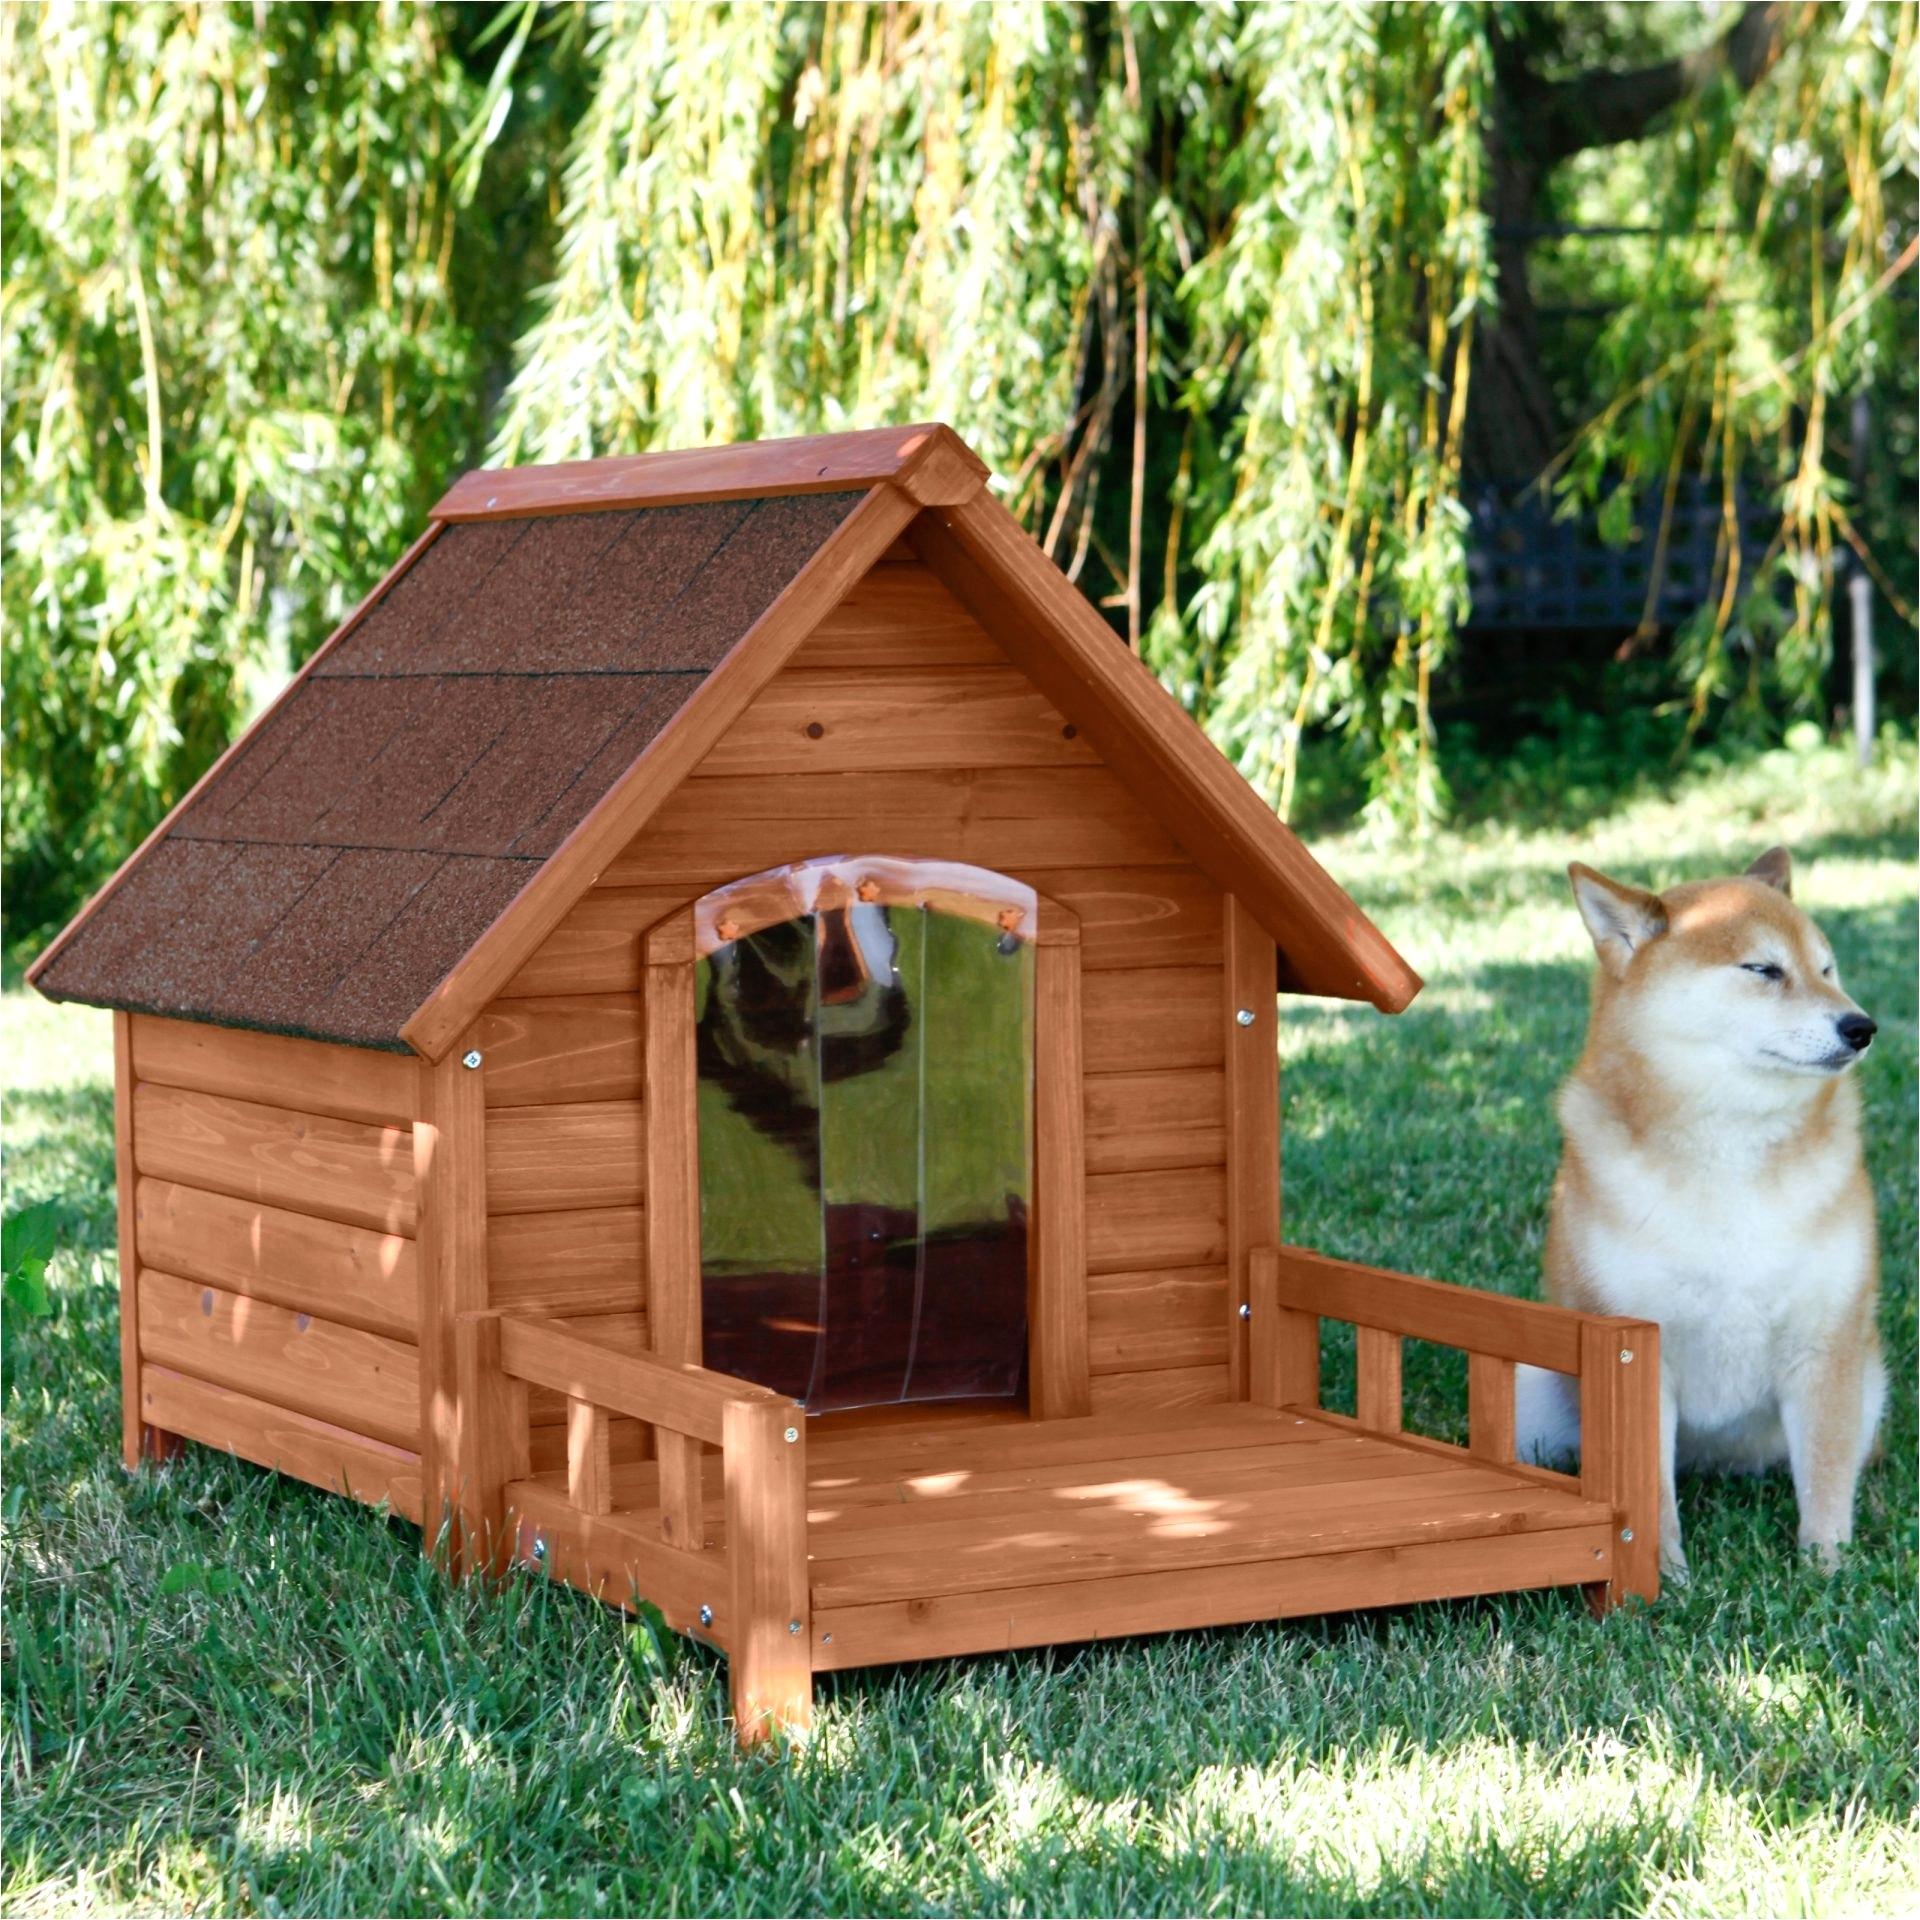 free dog house plans with porch elegant free dog house plans with porch beautiful house plan diy dog house